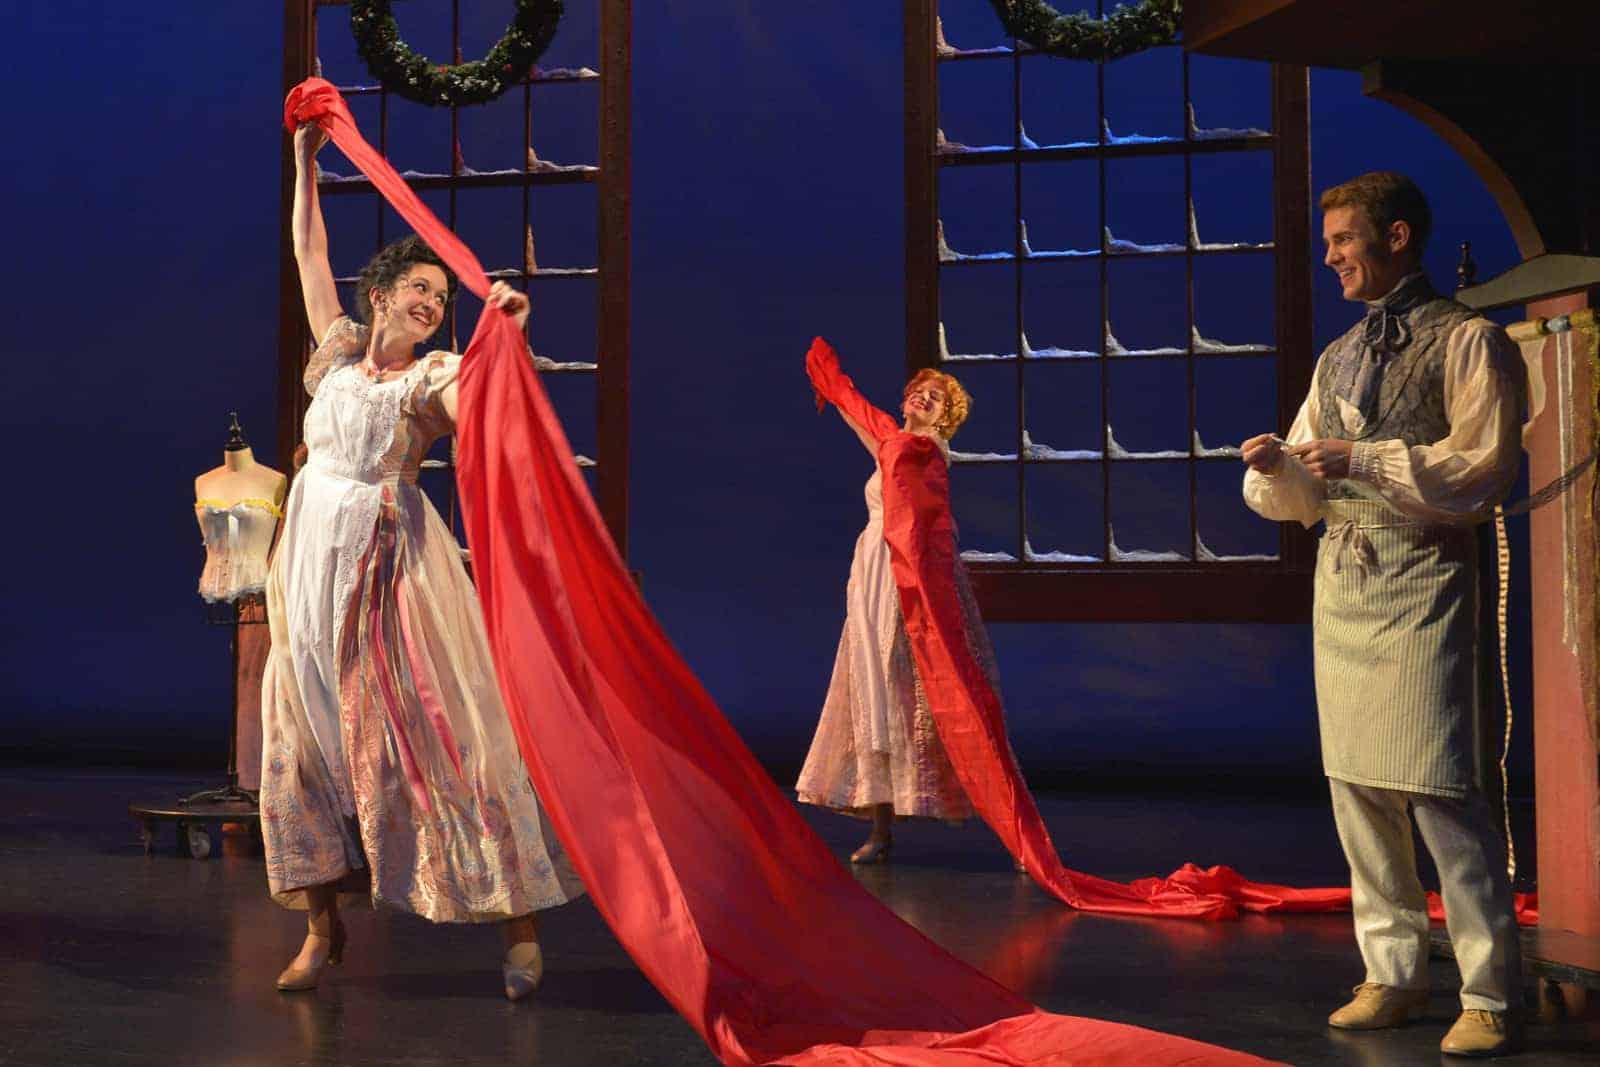 Act Christmas Carol.A Christmas Carol Cheers And Inspires At The Act Stark Insider